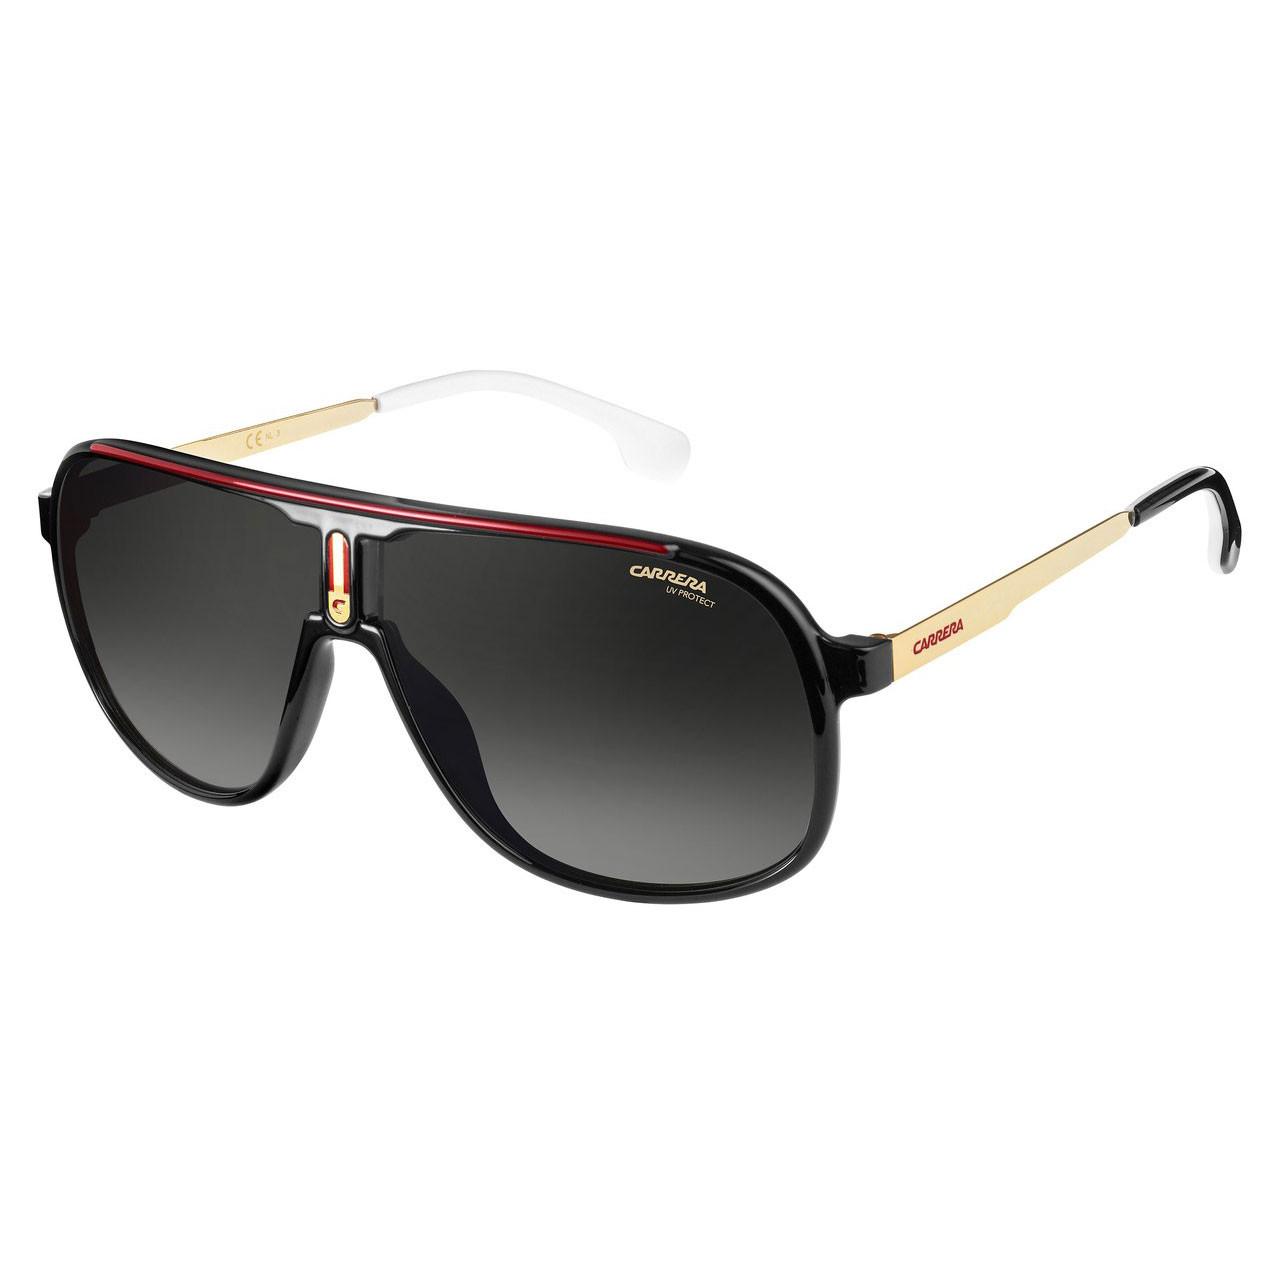 587b7d7e567 Carrera 1007 S - Visionary Optometrists